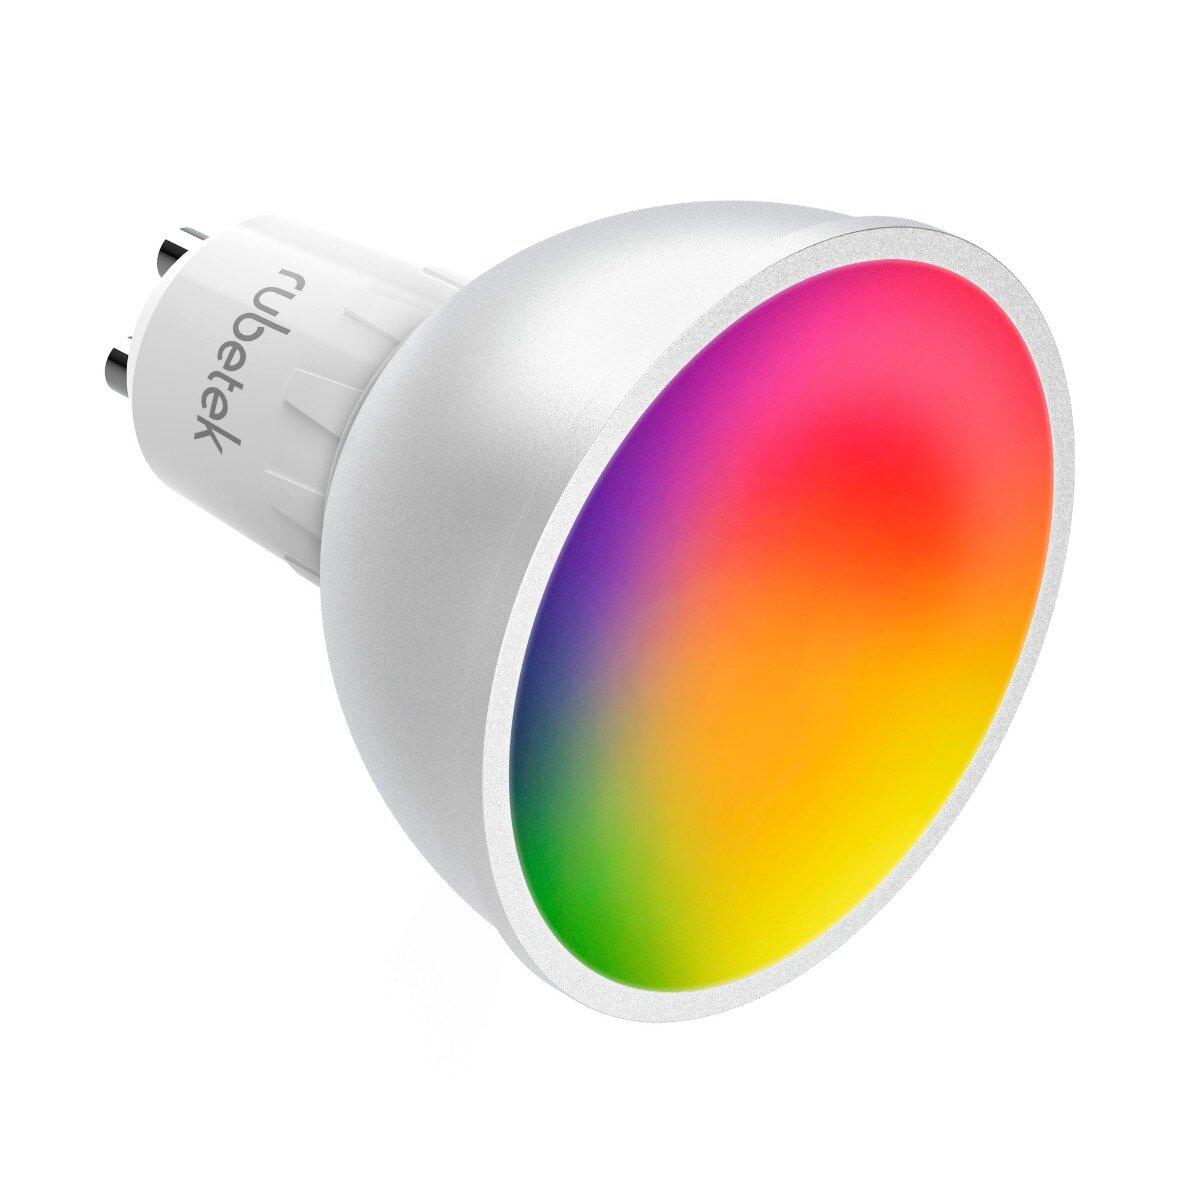 Лампа Rubetek GU10 5Вт фото 1